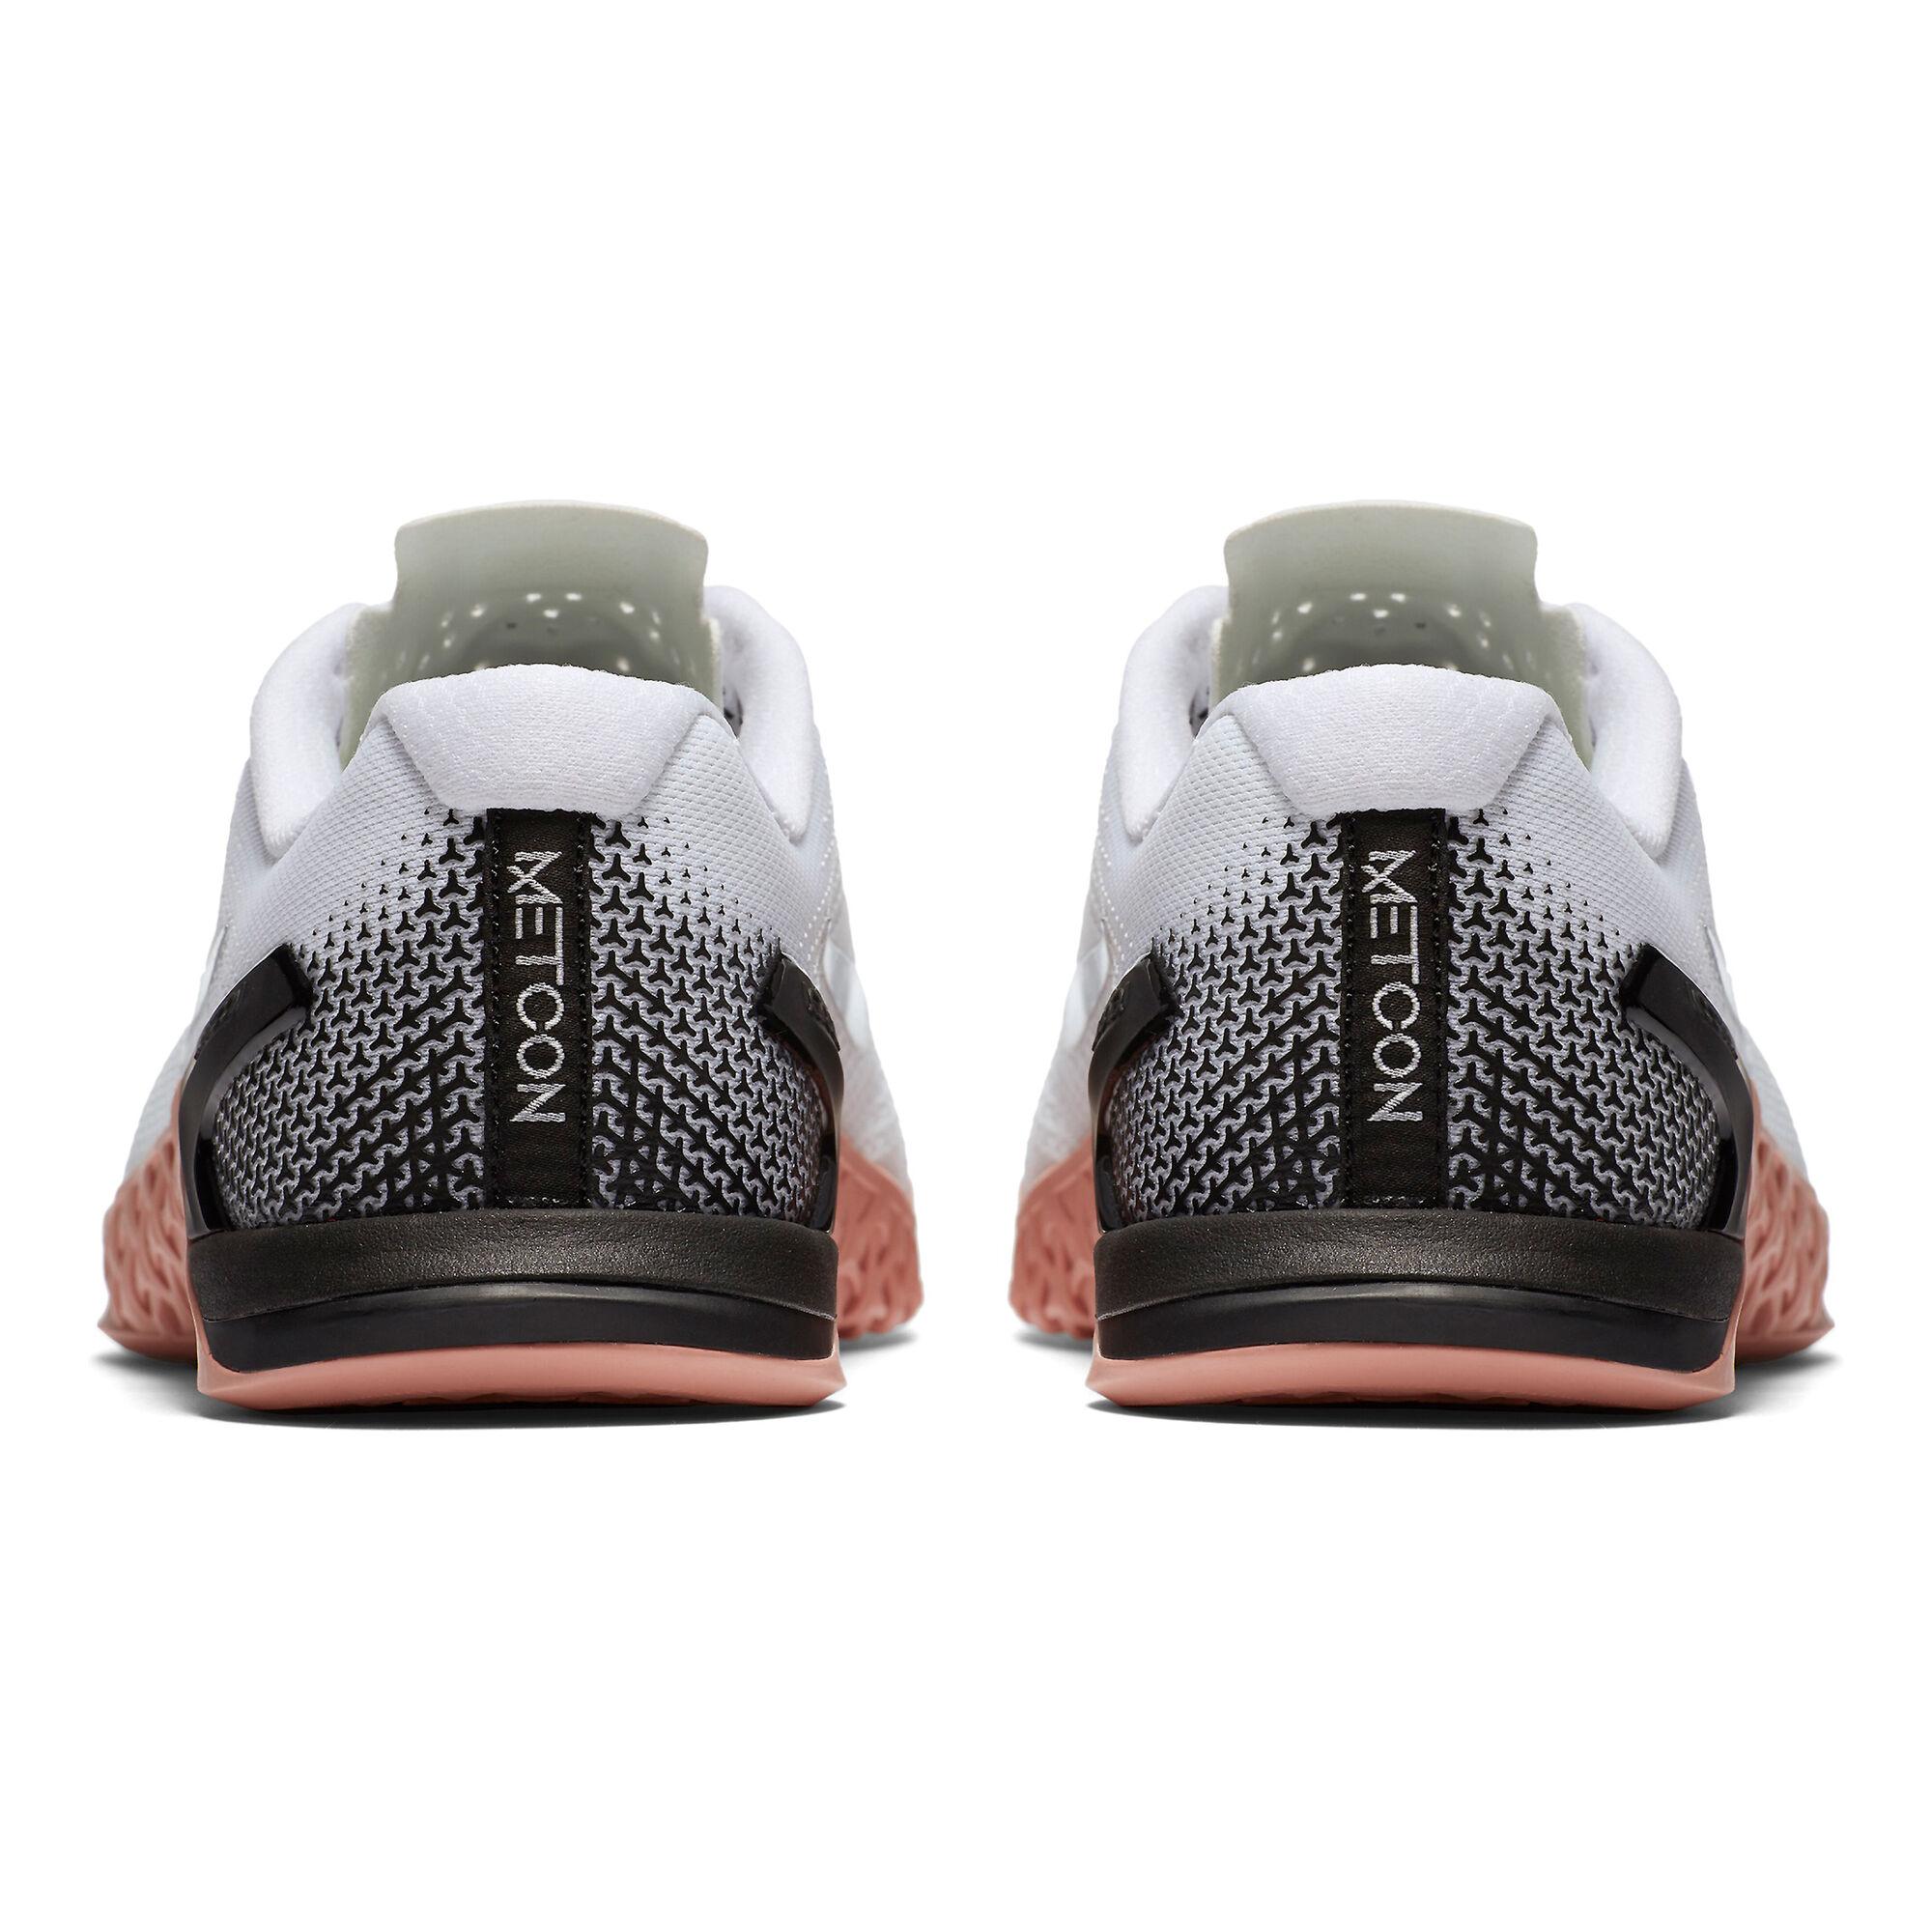 buy online 2c381 76b01 Nike Metcon 4 Fitnessschuh Damen - Weiß, Rosa online kaufen